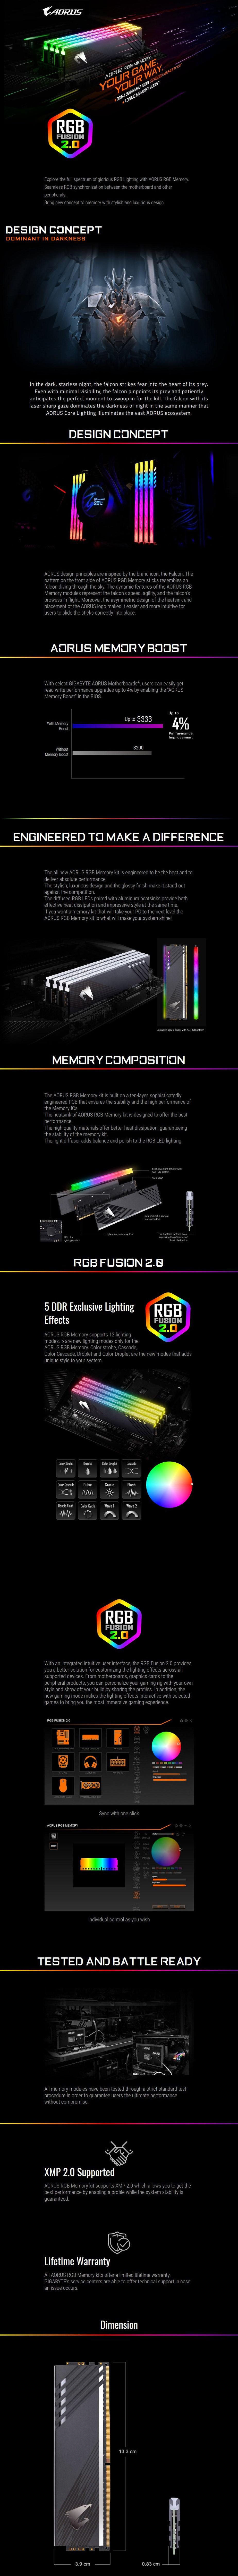 Gigabyte AORUS RGB 16GB (2x 8GB) DDR4 3200MHz Memory - Overview 1